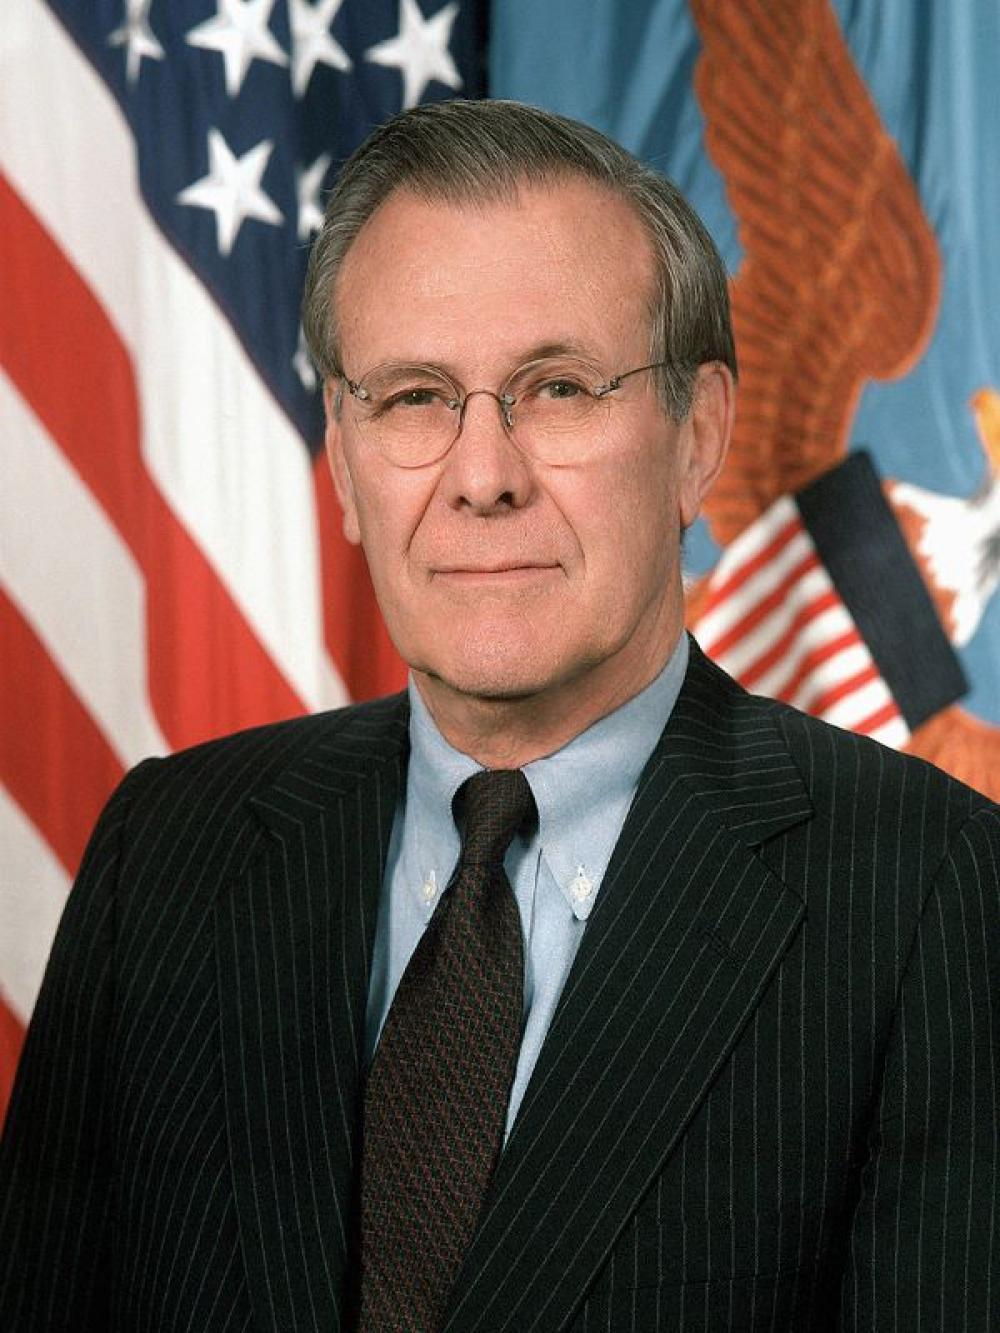 Donald Rumsfeld: Two-time US Defense Secretary who led America